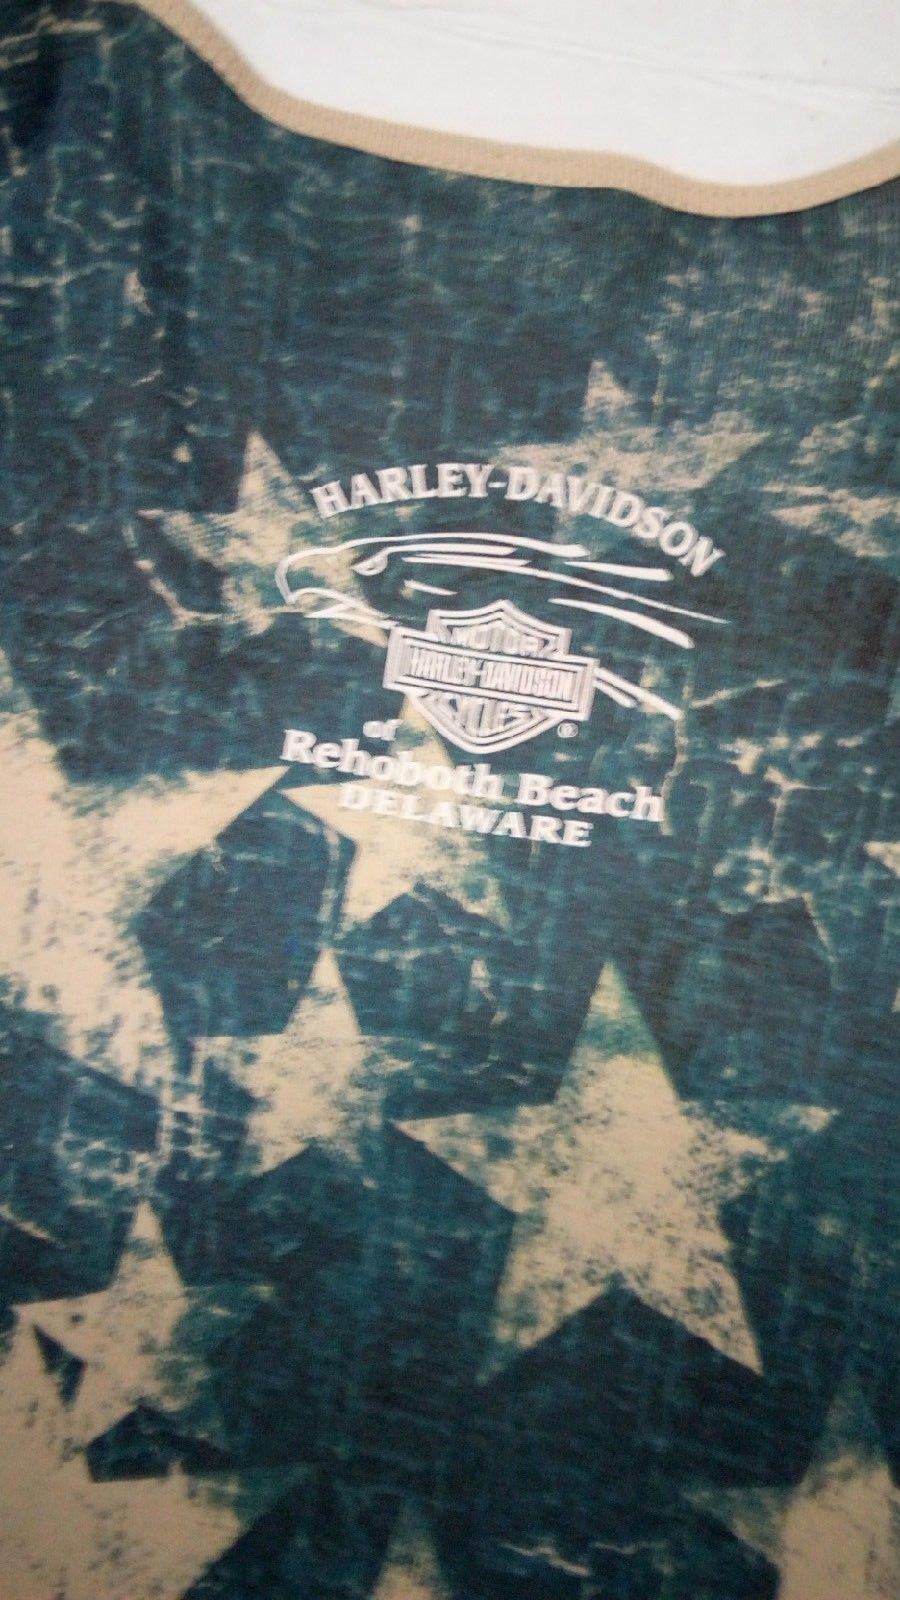 Harley Davidson Of Rehoboth Beach Delaware XL US Flag Womens embellished Blouse  image 10